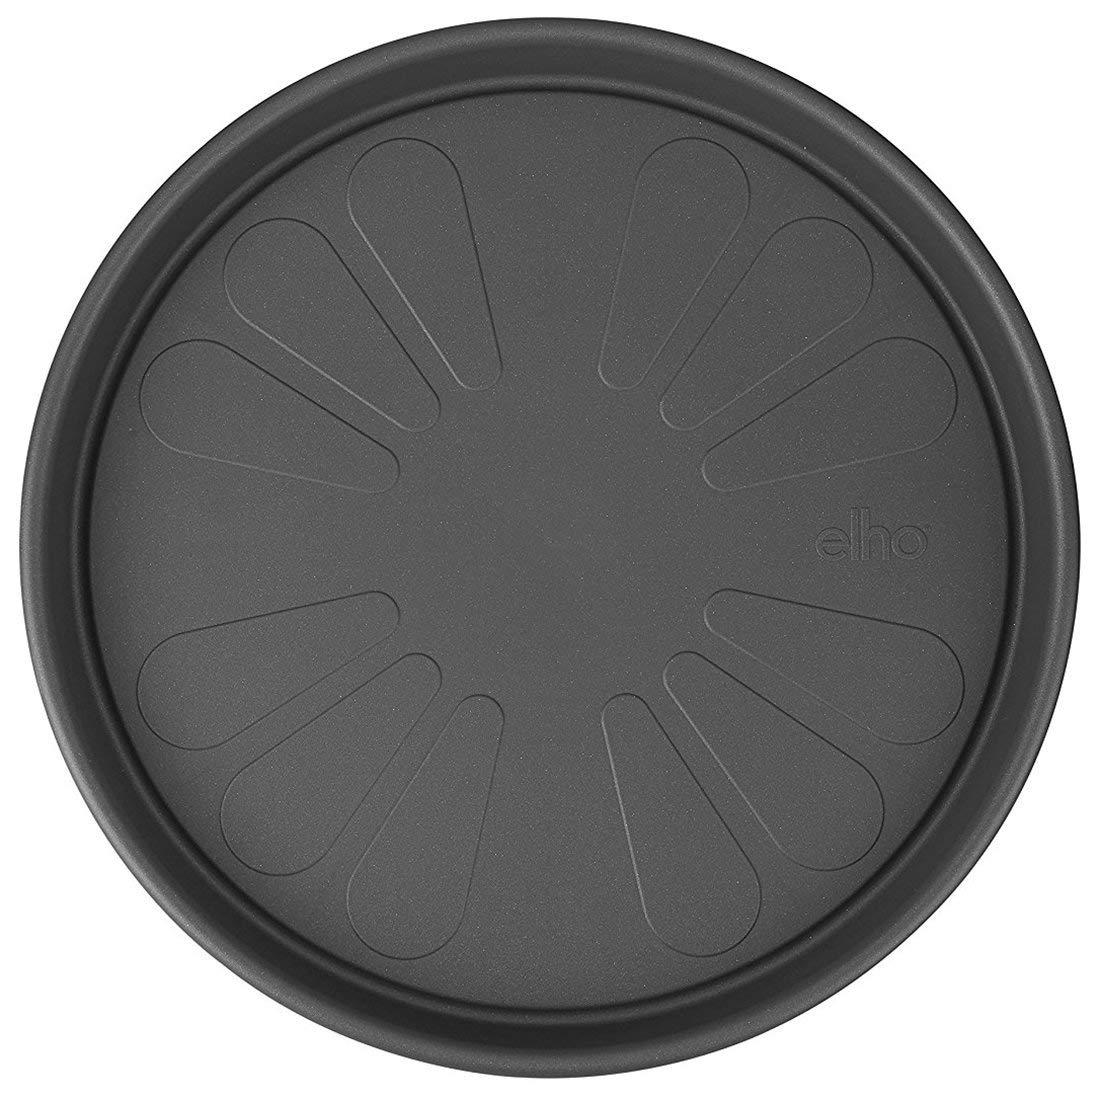 Elho universal planttaxi 35cm saucer - anthracite 6440543442500